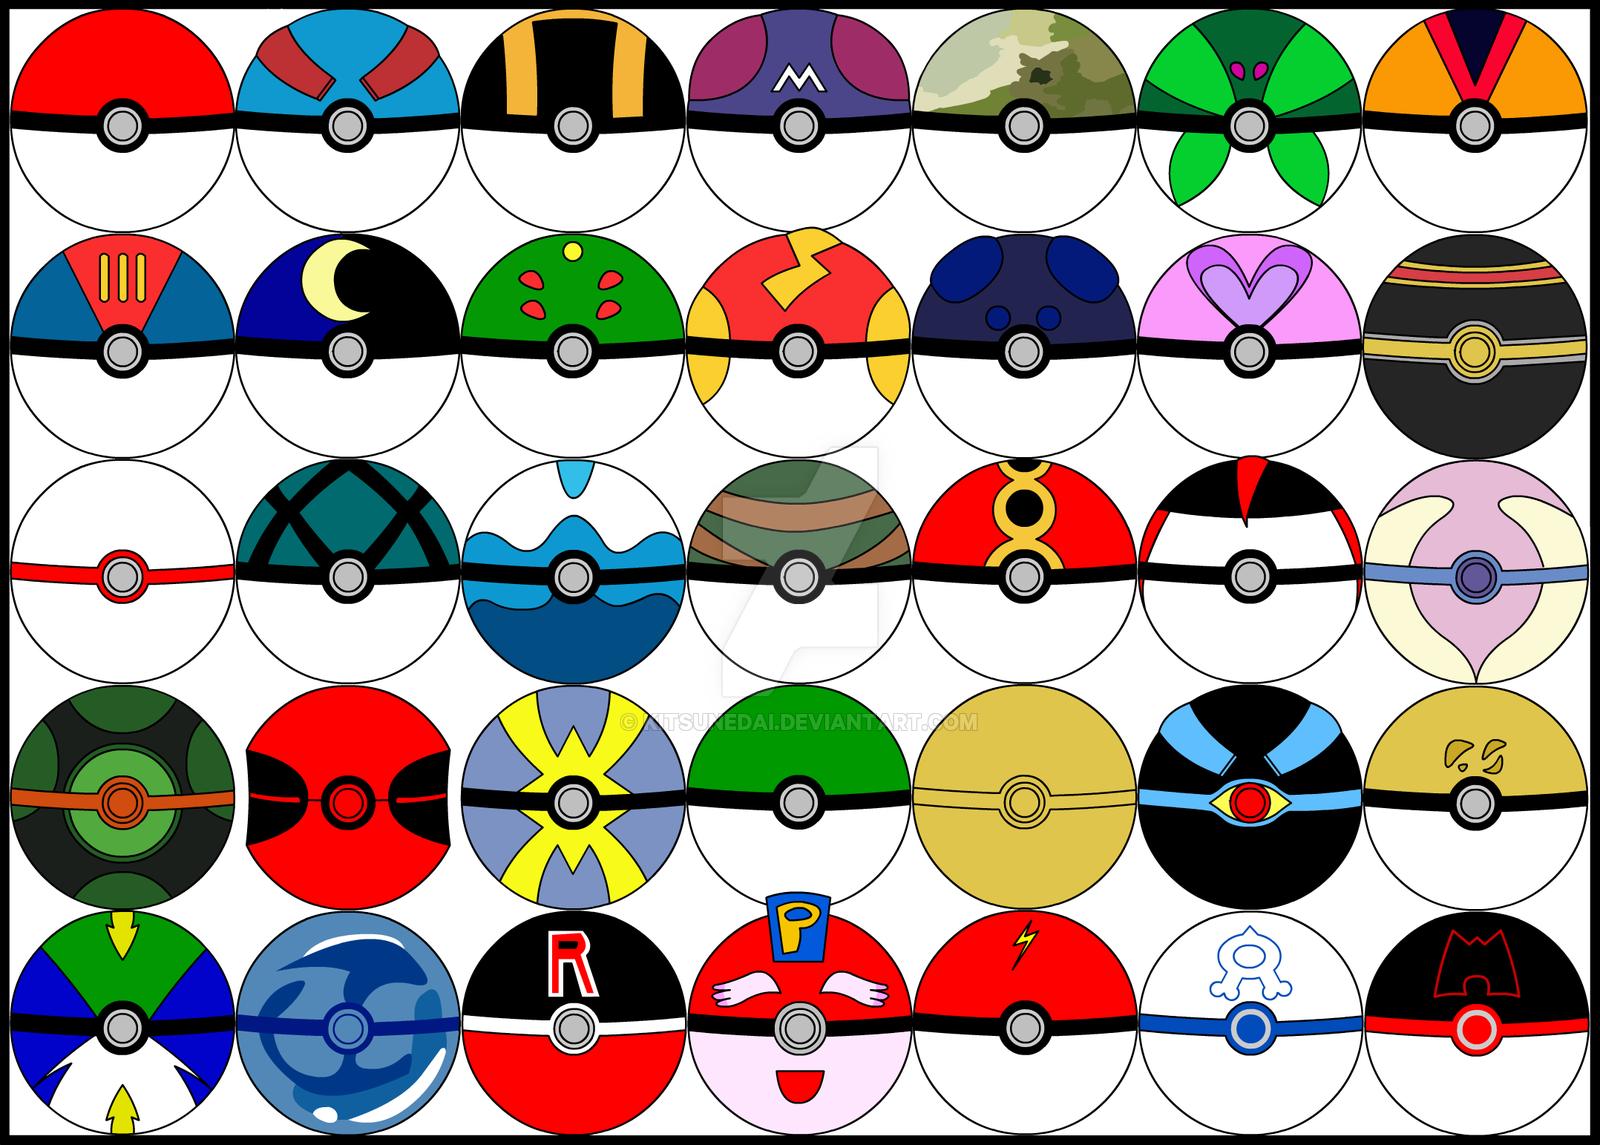 Drawn pokeball pokemon Mania Kitsunedai DeviantArt by by